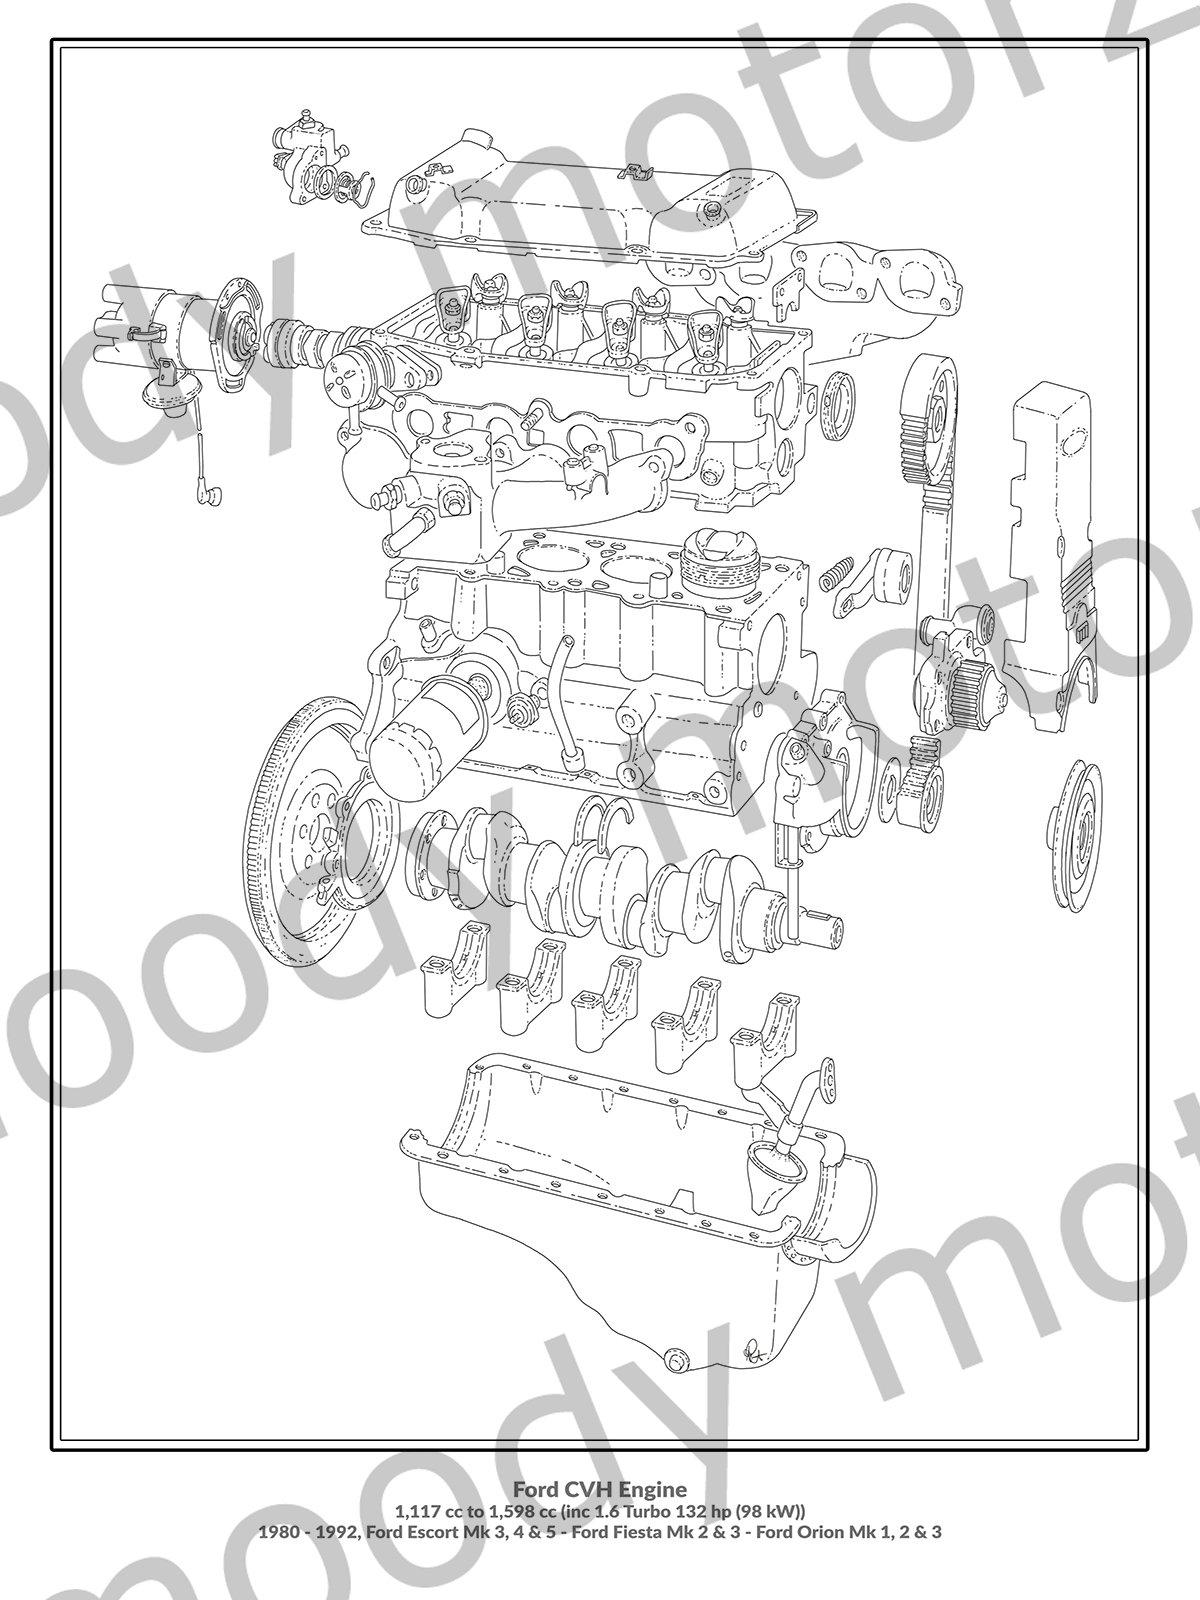 CX_0816] 92 Ford Fiesta Engine Diagram Download DiagramSemec Brom Hutpa Dict Vira Mohammedshrine Librar Wiring 101